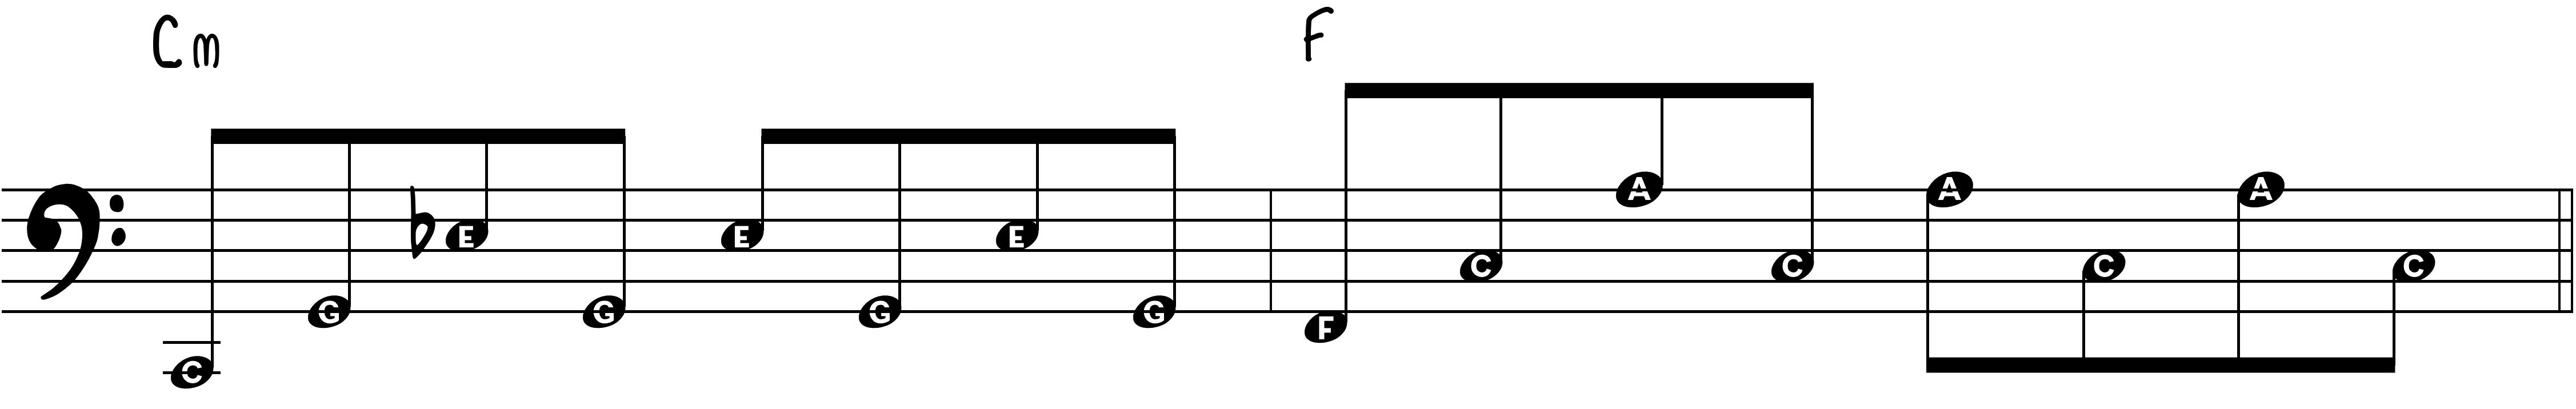 Left Hand Applied Accompaniment Pattern (intermediate)